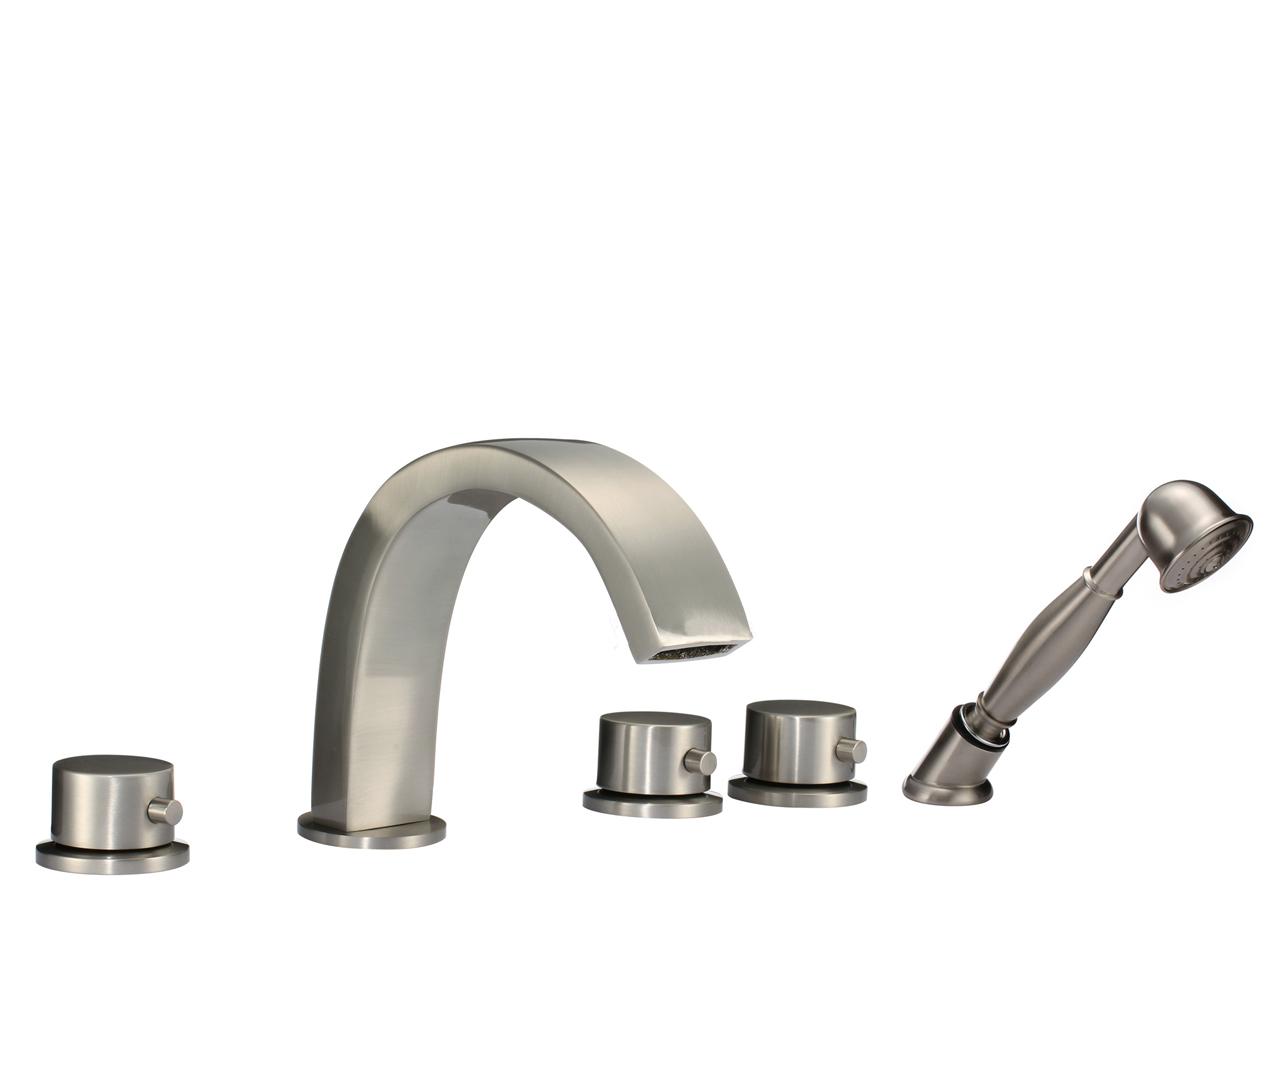 Shop Lyon Triple Handle Solid Brass Bathroom Sink Faucet At Bathselect